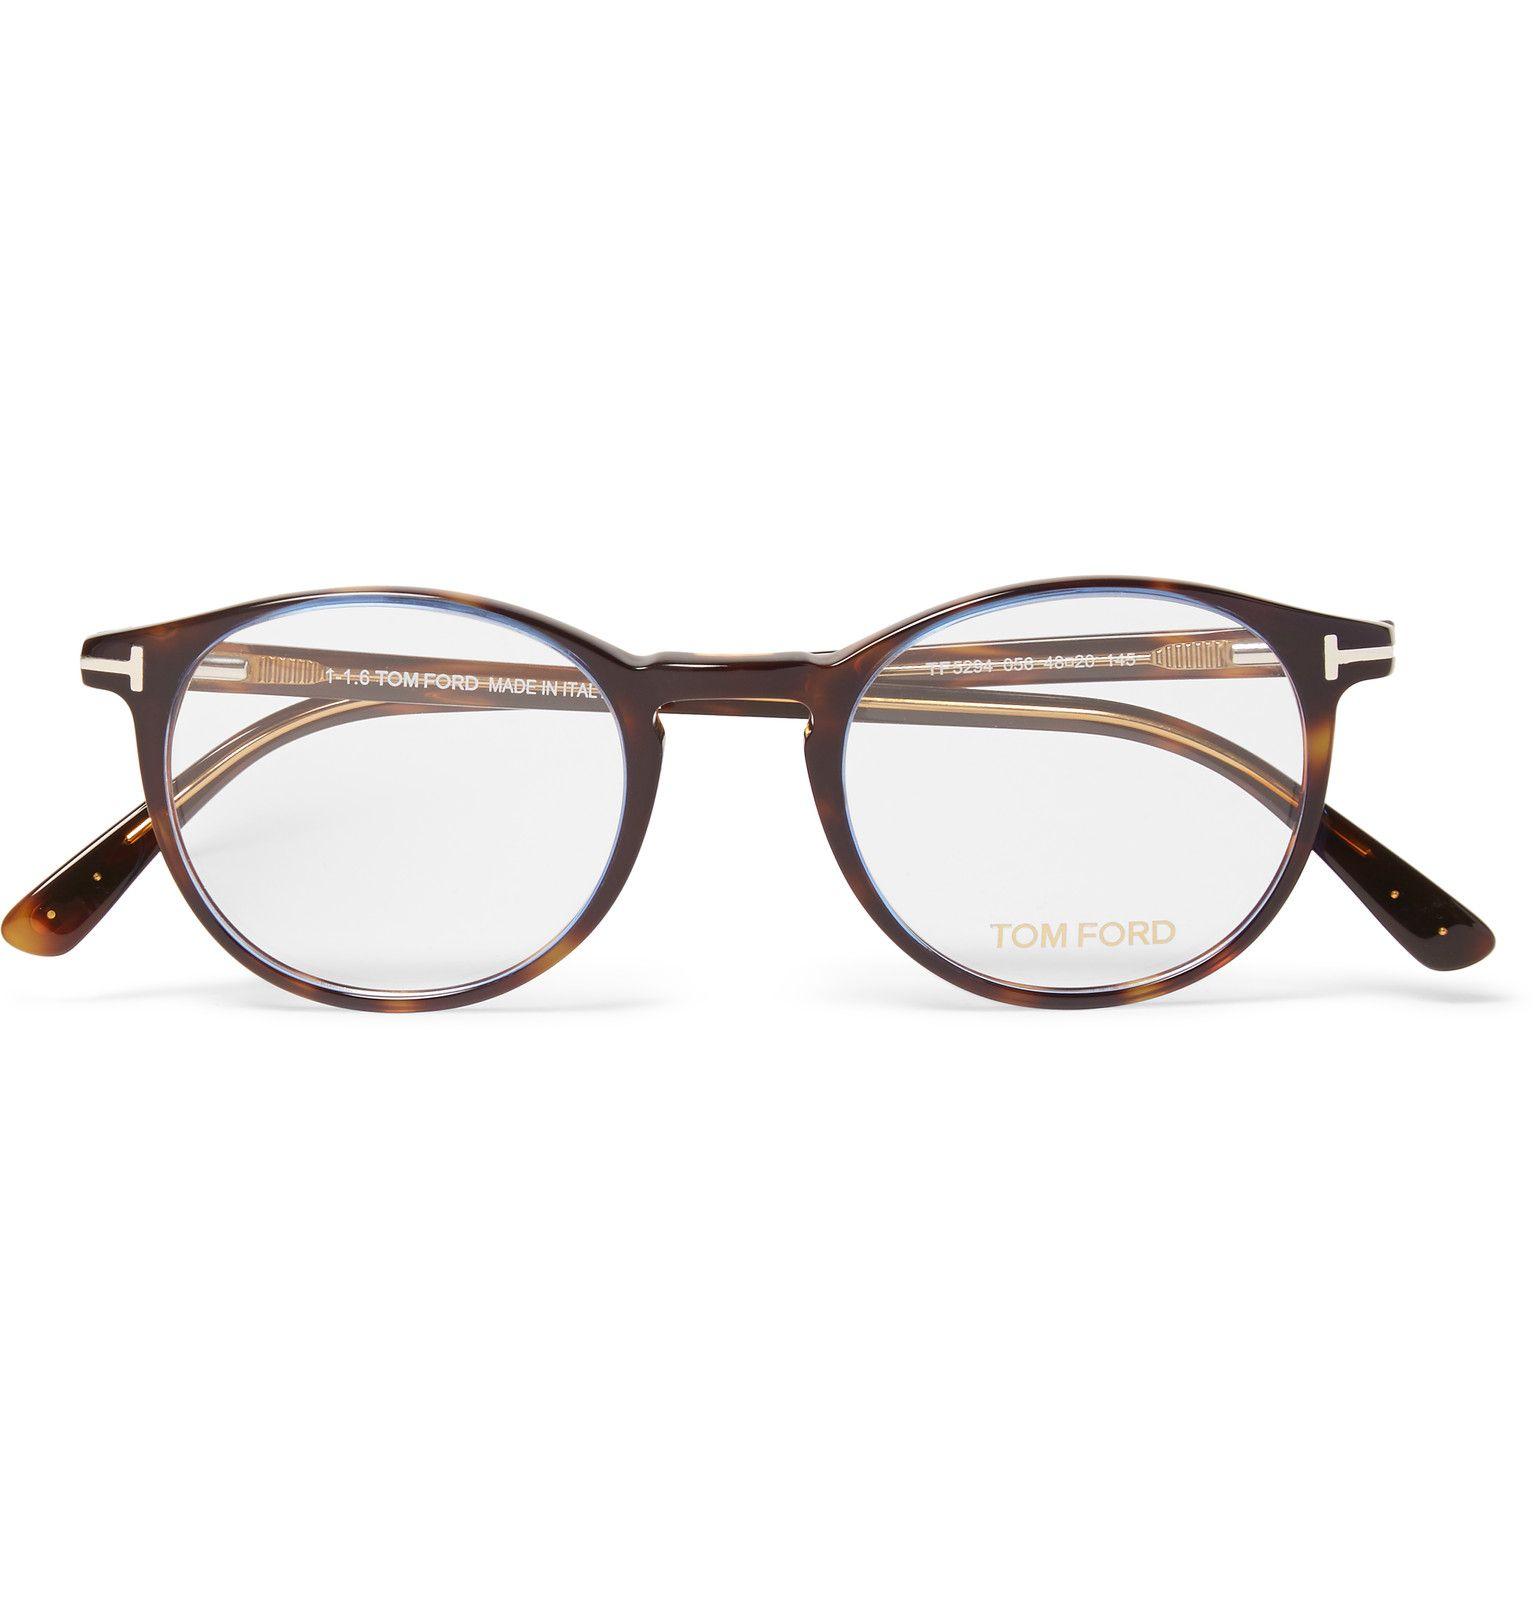 8db7cc4a0e49 Tom Ford Round Frame Tortoiseshell Acetate Optical Glasses